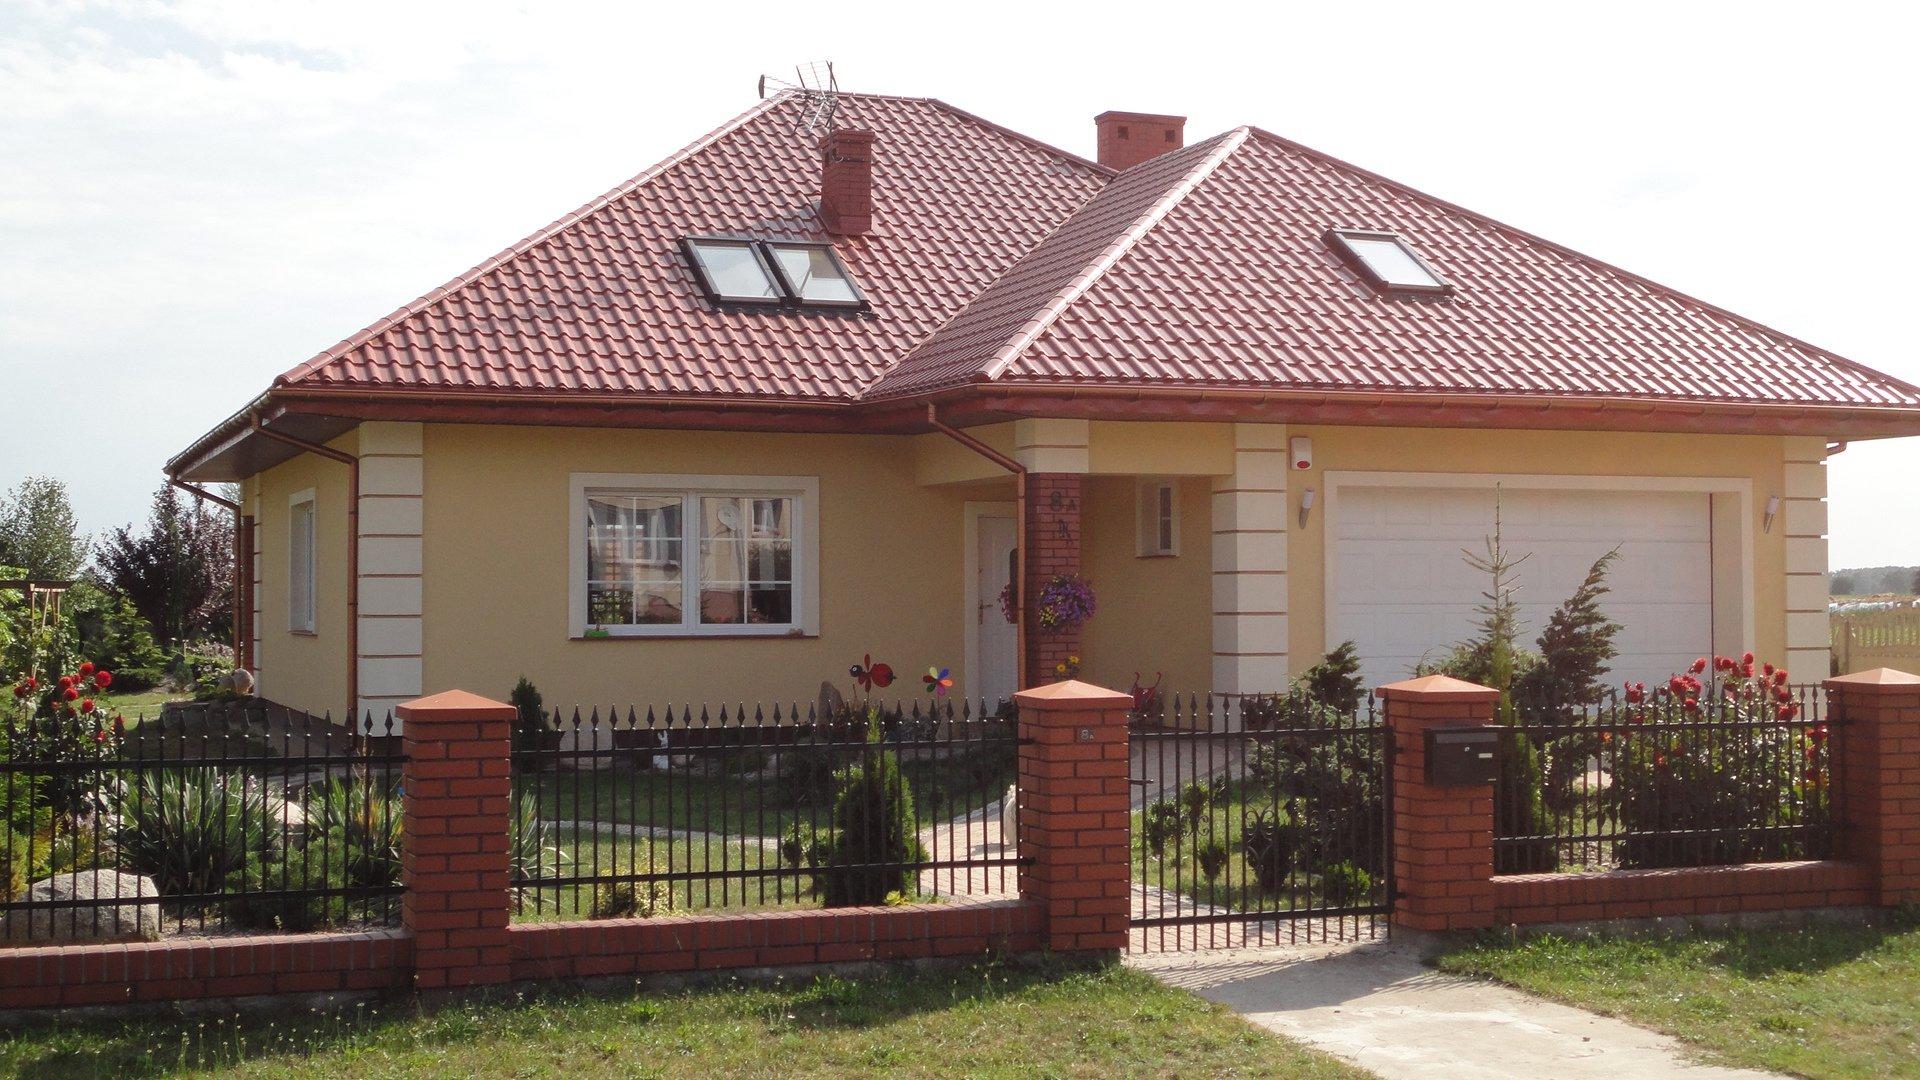 tomasz-ulanowski-134374526678.jpg